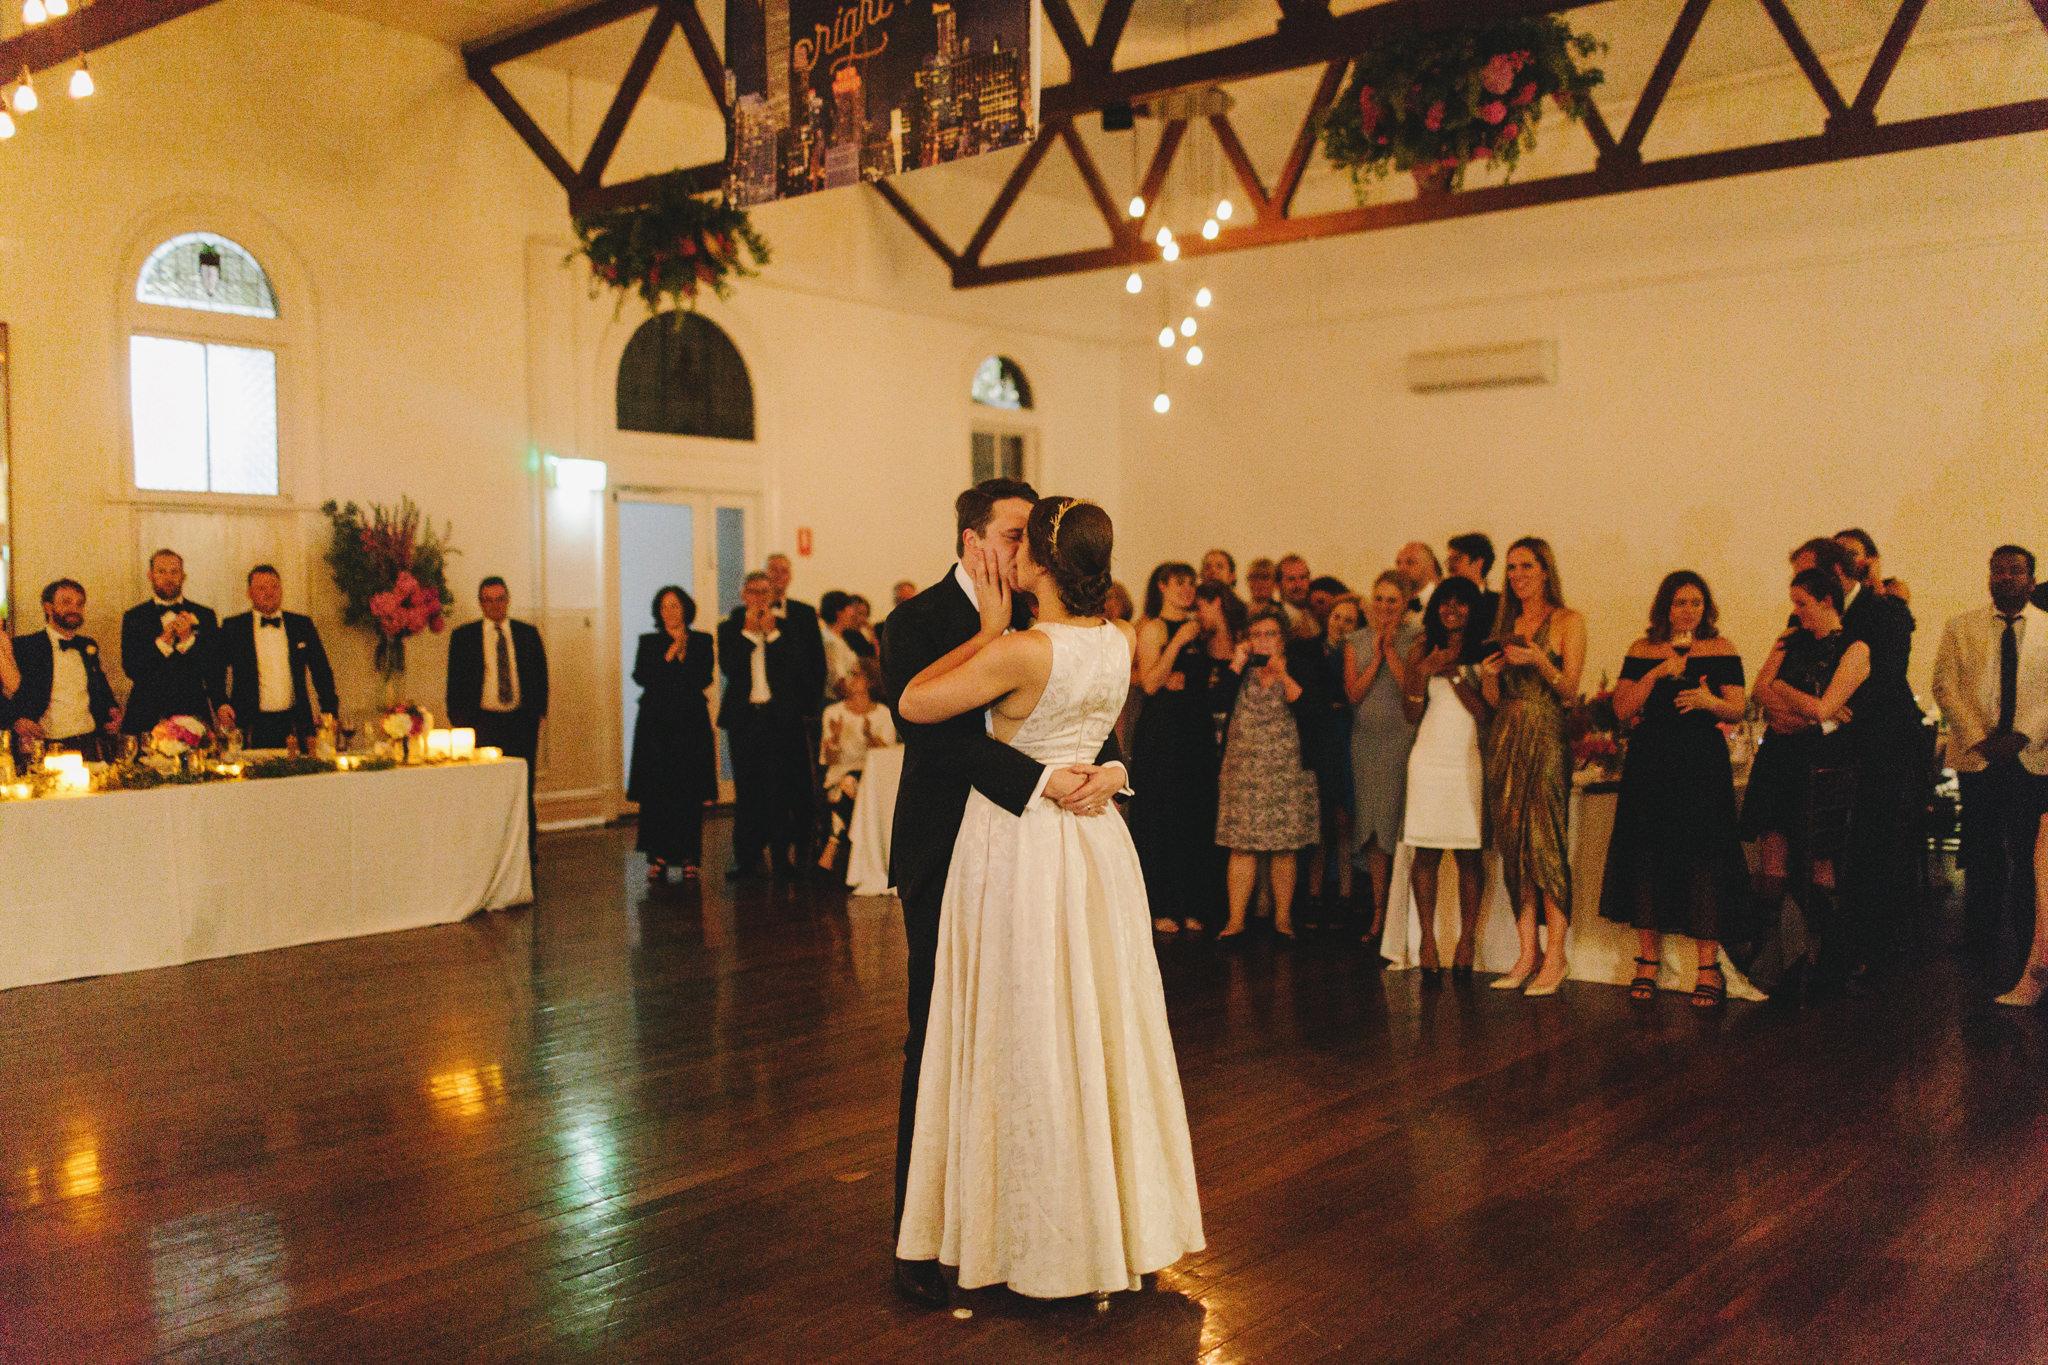 Abbotsford_Convent_Wedding_Peter_Anna139.JPG